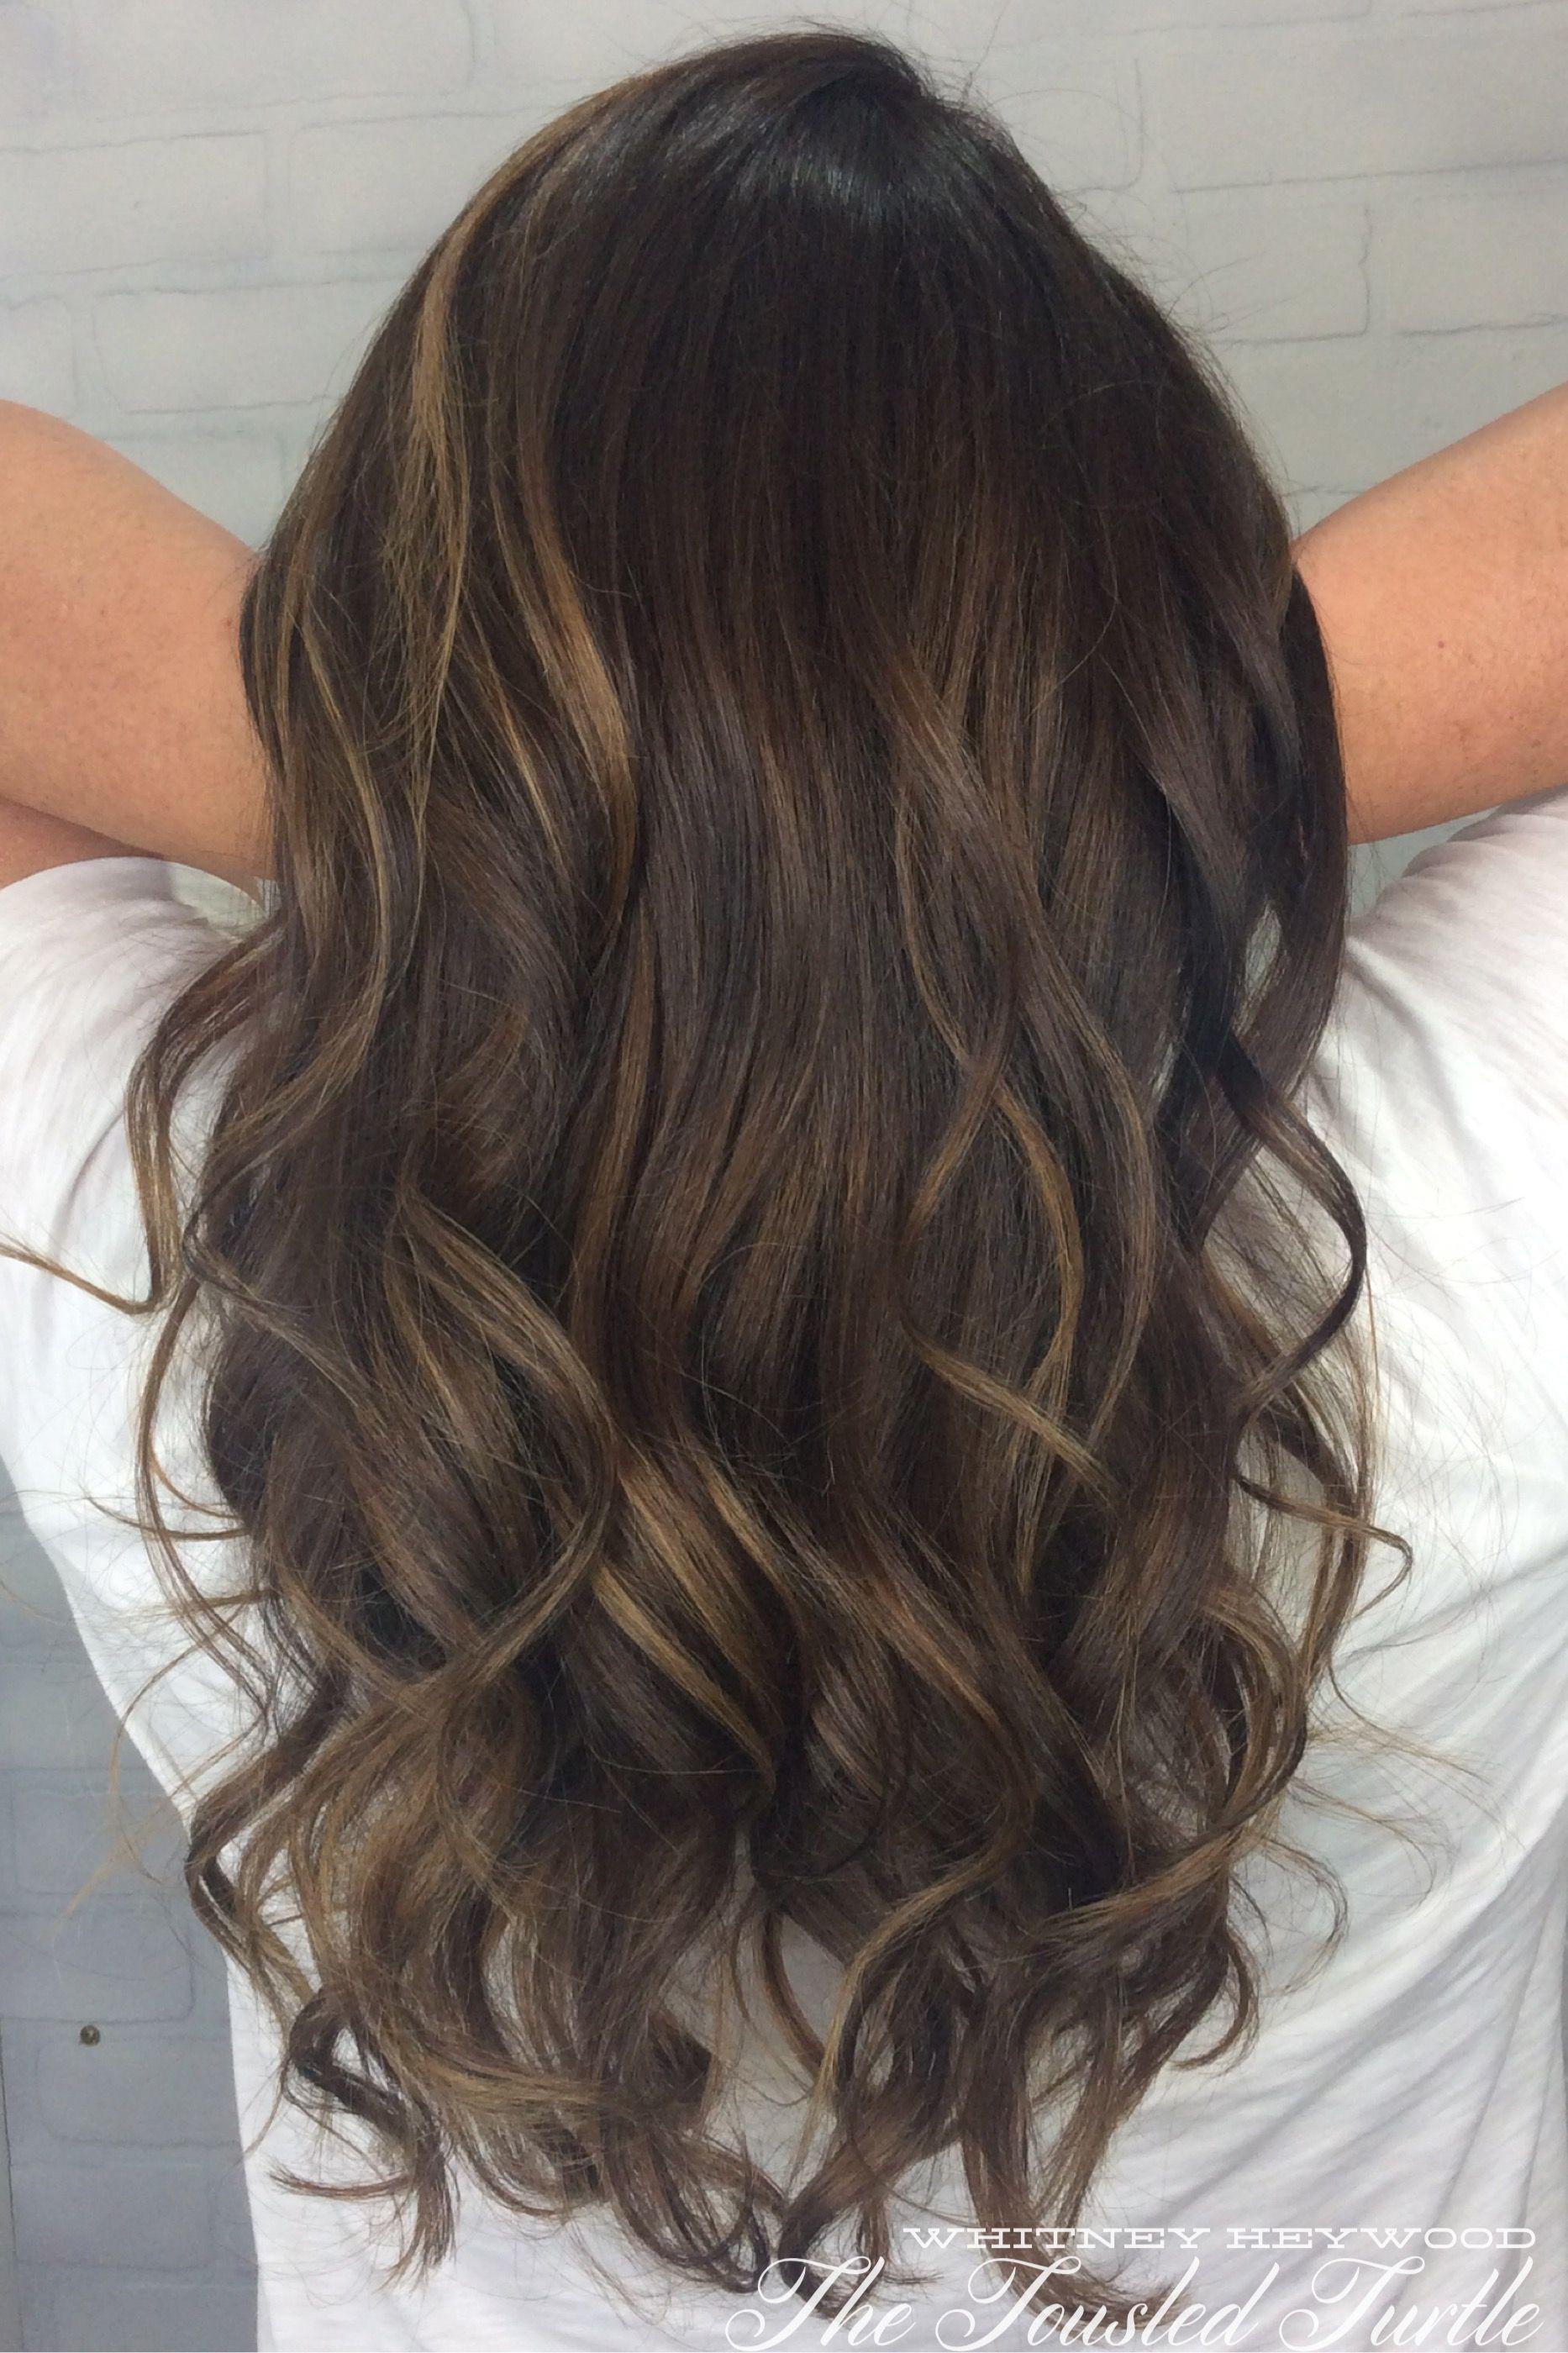 Thetousledturtle Dimensional Brunette Fall Hair Color Balayage Hair Blonde Long Hair Highlights Fall Hair